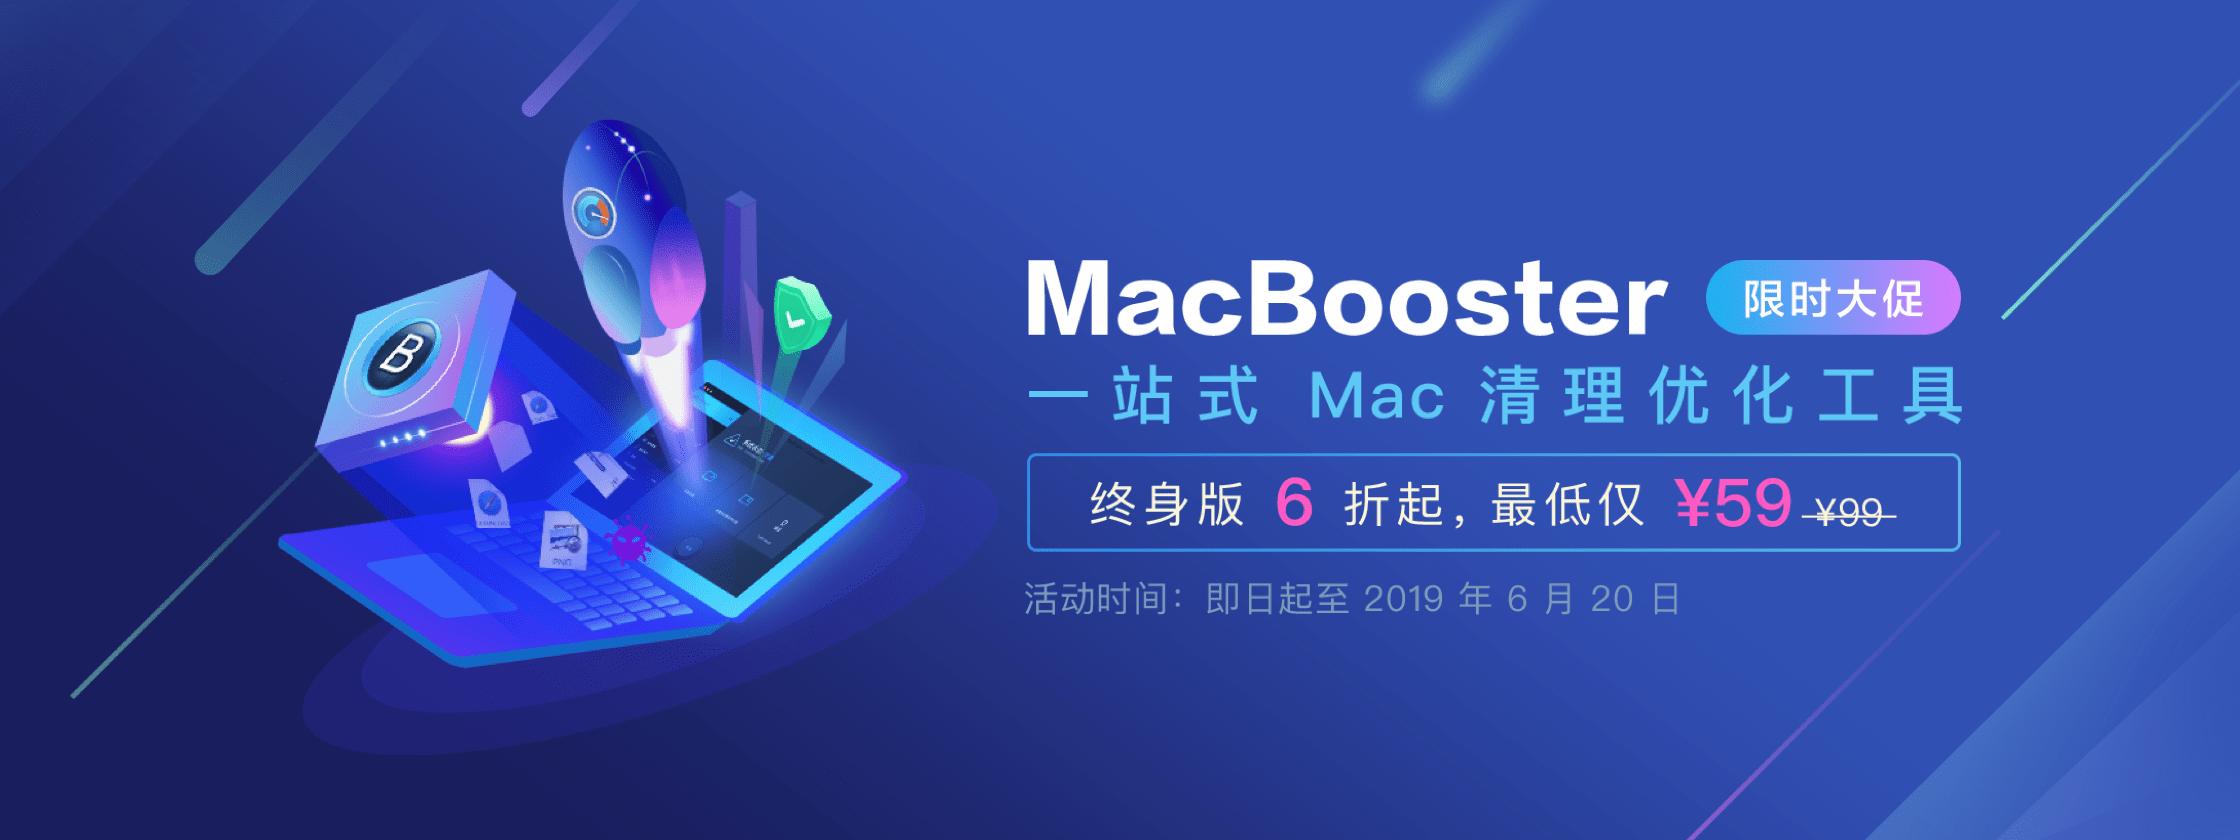 Mac 清理优化工具 MacBooster 限时特惠,终生版6折最低仅需 59 元